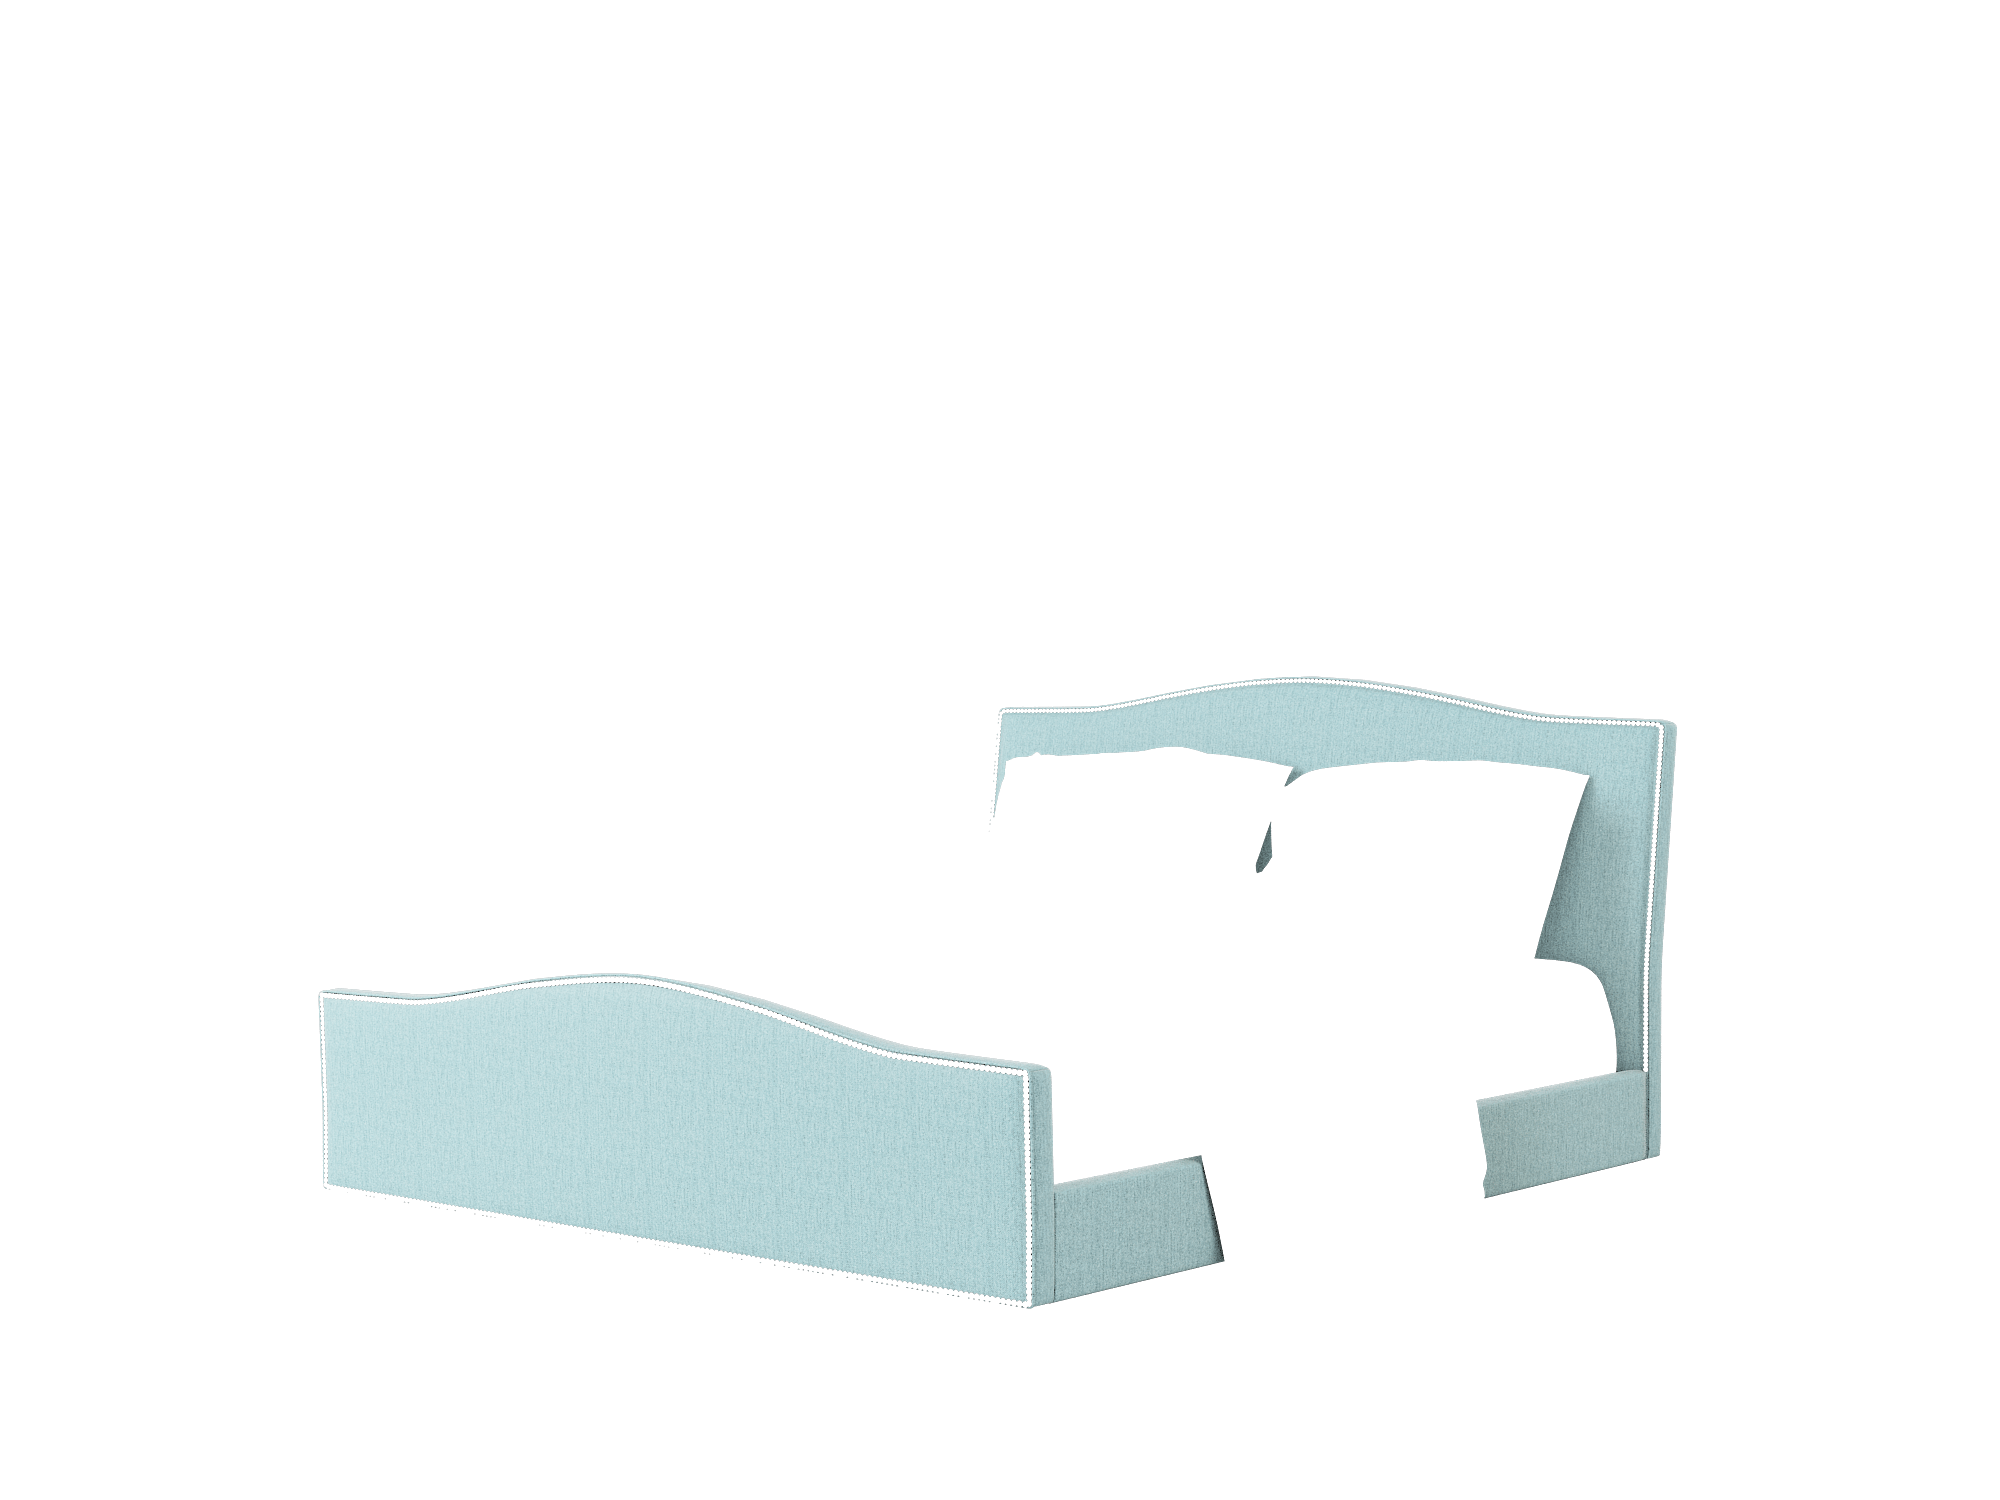 Prato Sasha Teal Bed King Room Texture